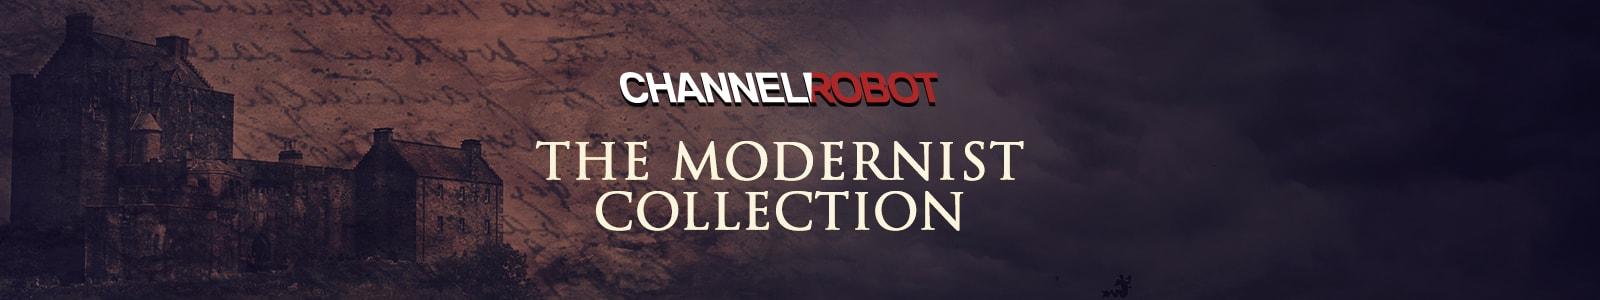 [DTMニュース]channel-robot-modernist-collection-1